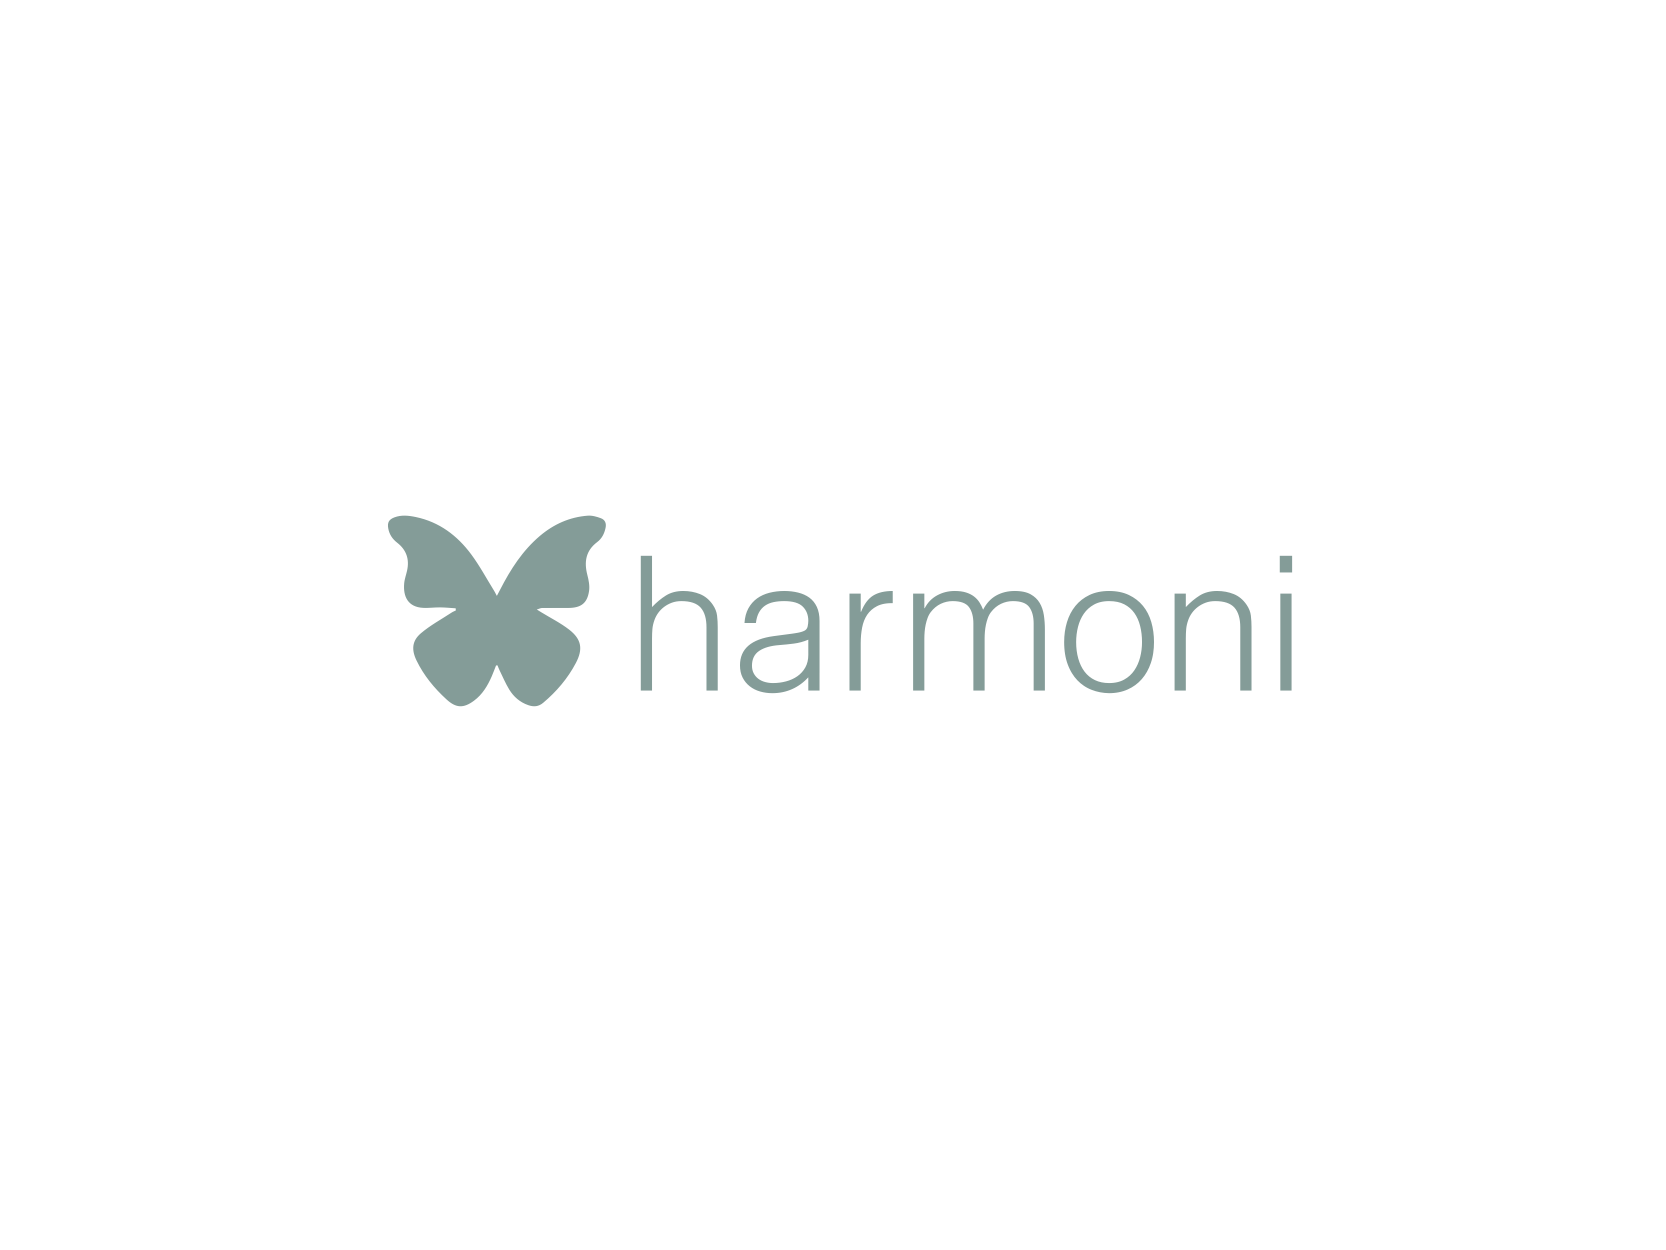 harmoni logo.png